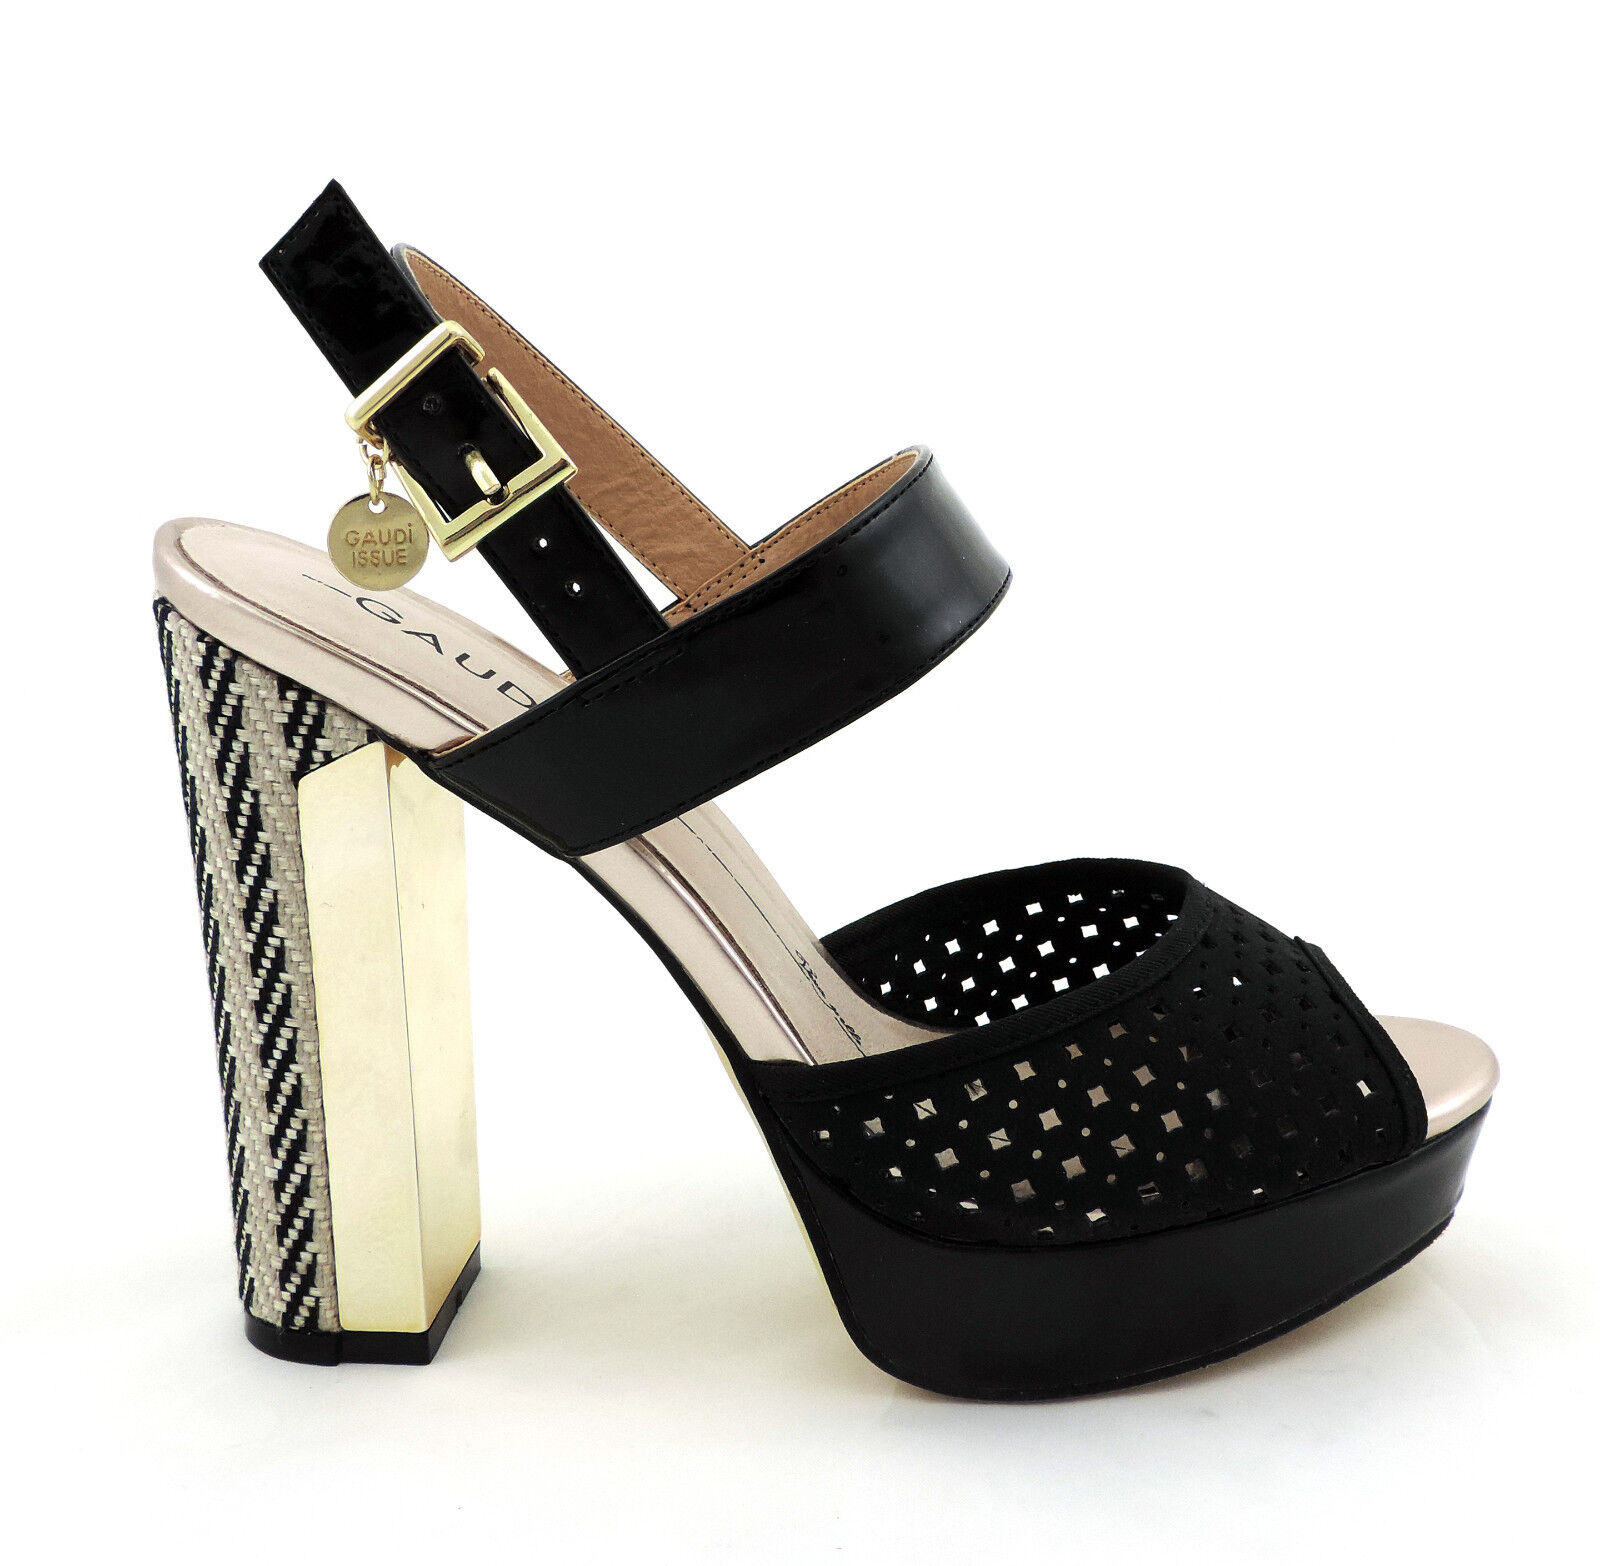 Gaudi shoes Sandale high heel schwarz Schuhe pumps neu